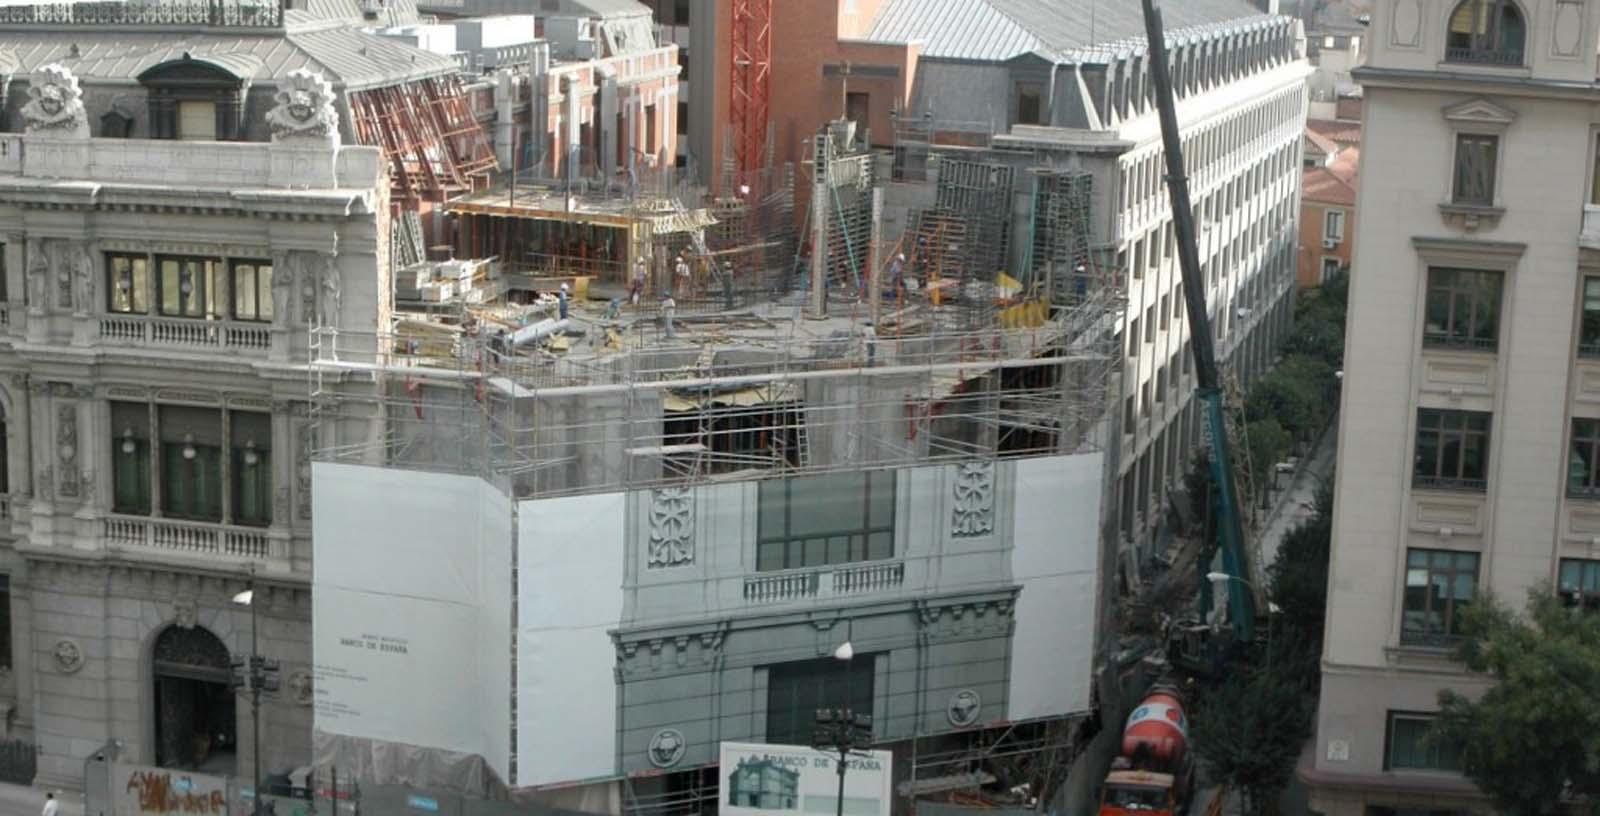 Banco_Espana_02_Building_Idom_1